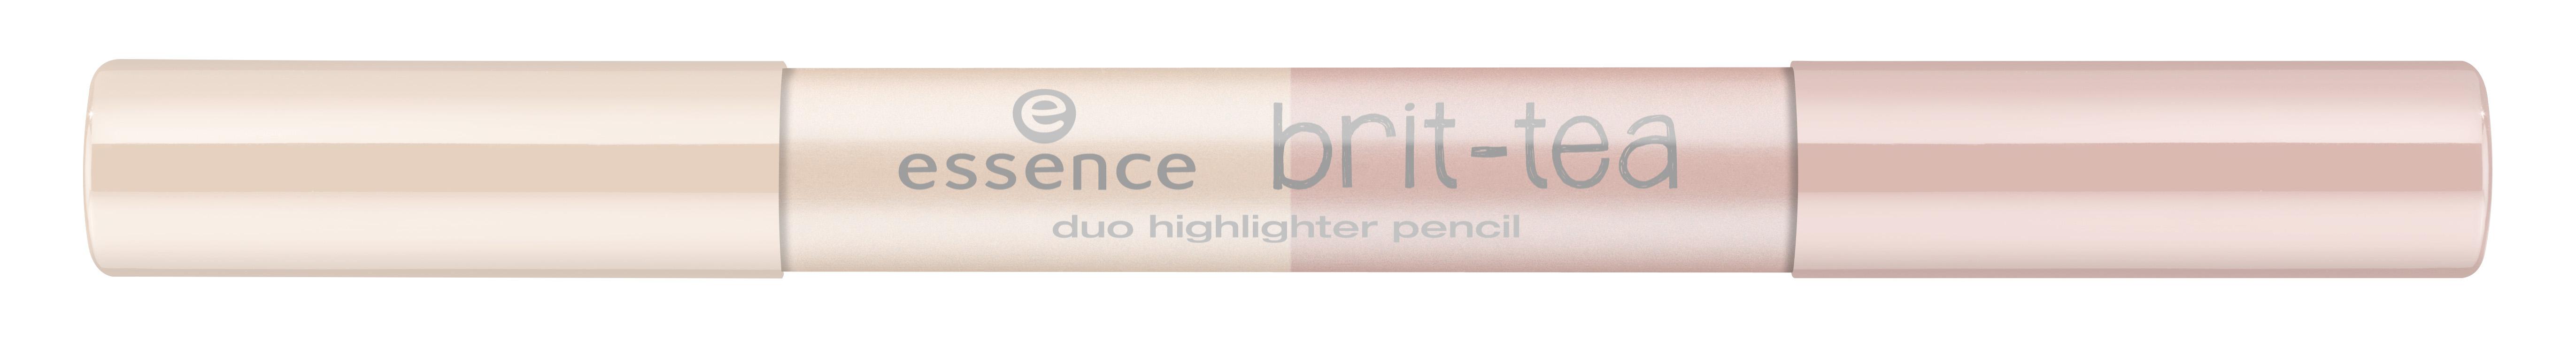 ess_brit-tea_Duo Hightlighter Pencil_#01.jpg